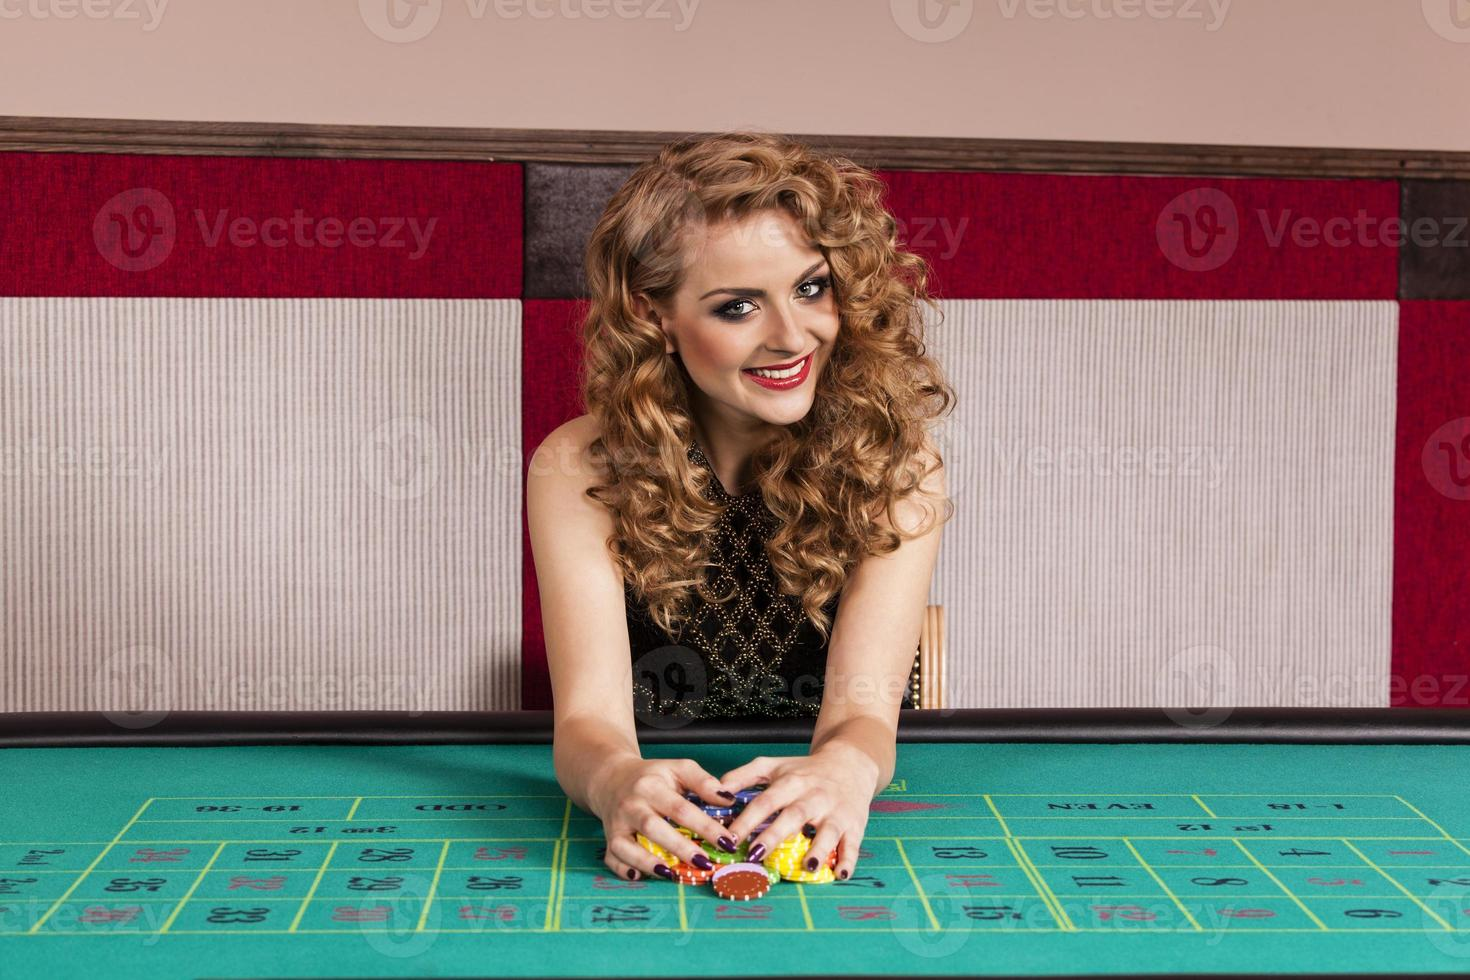 Blone elegant woman in casino photo